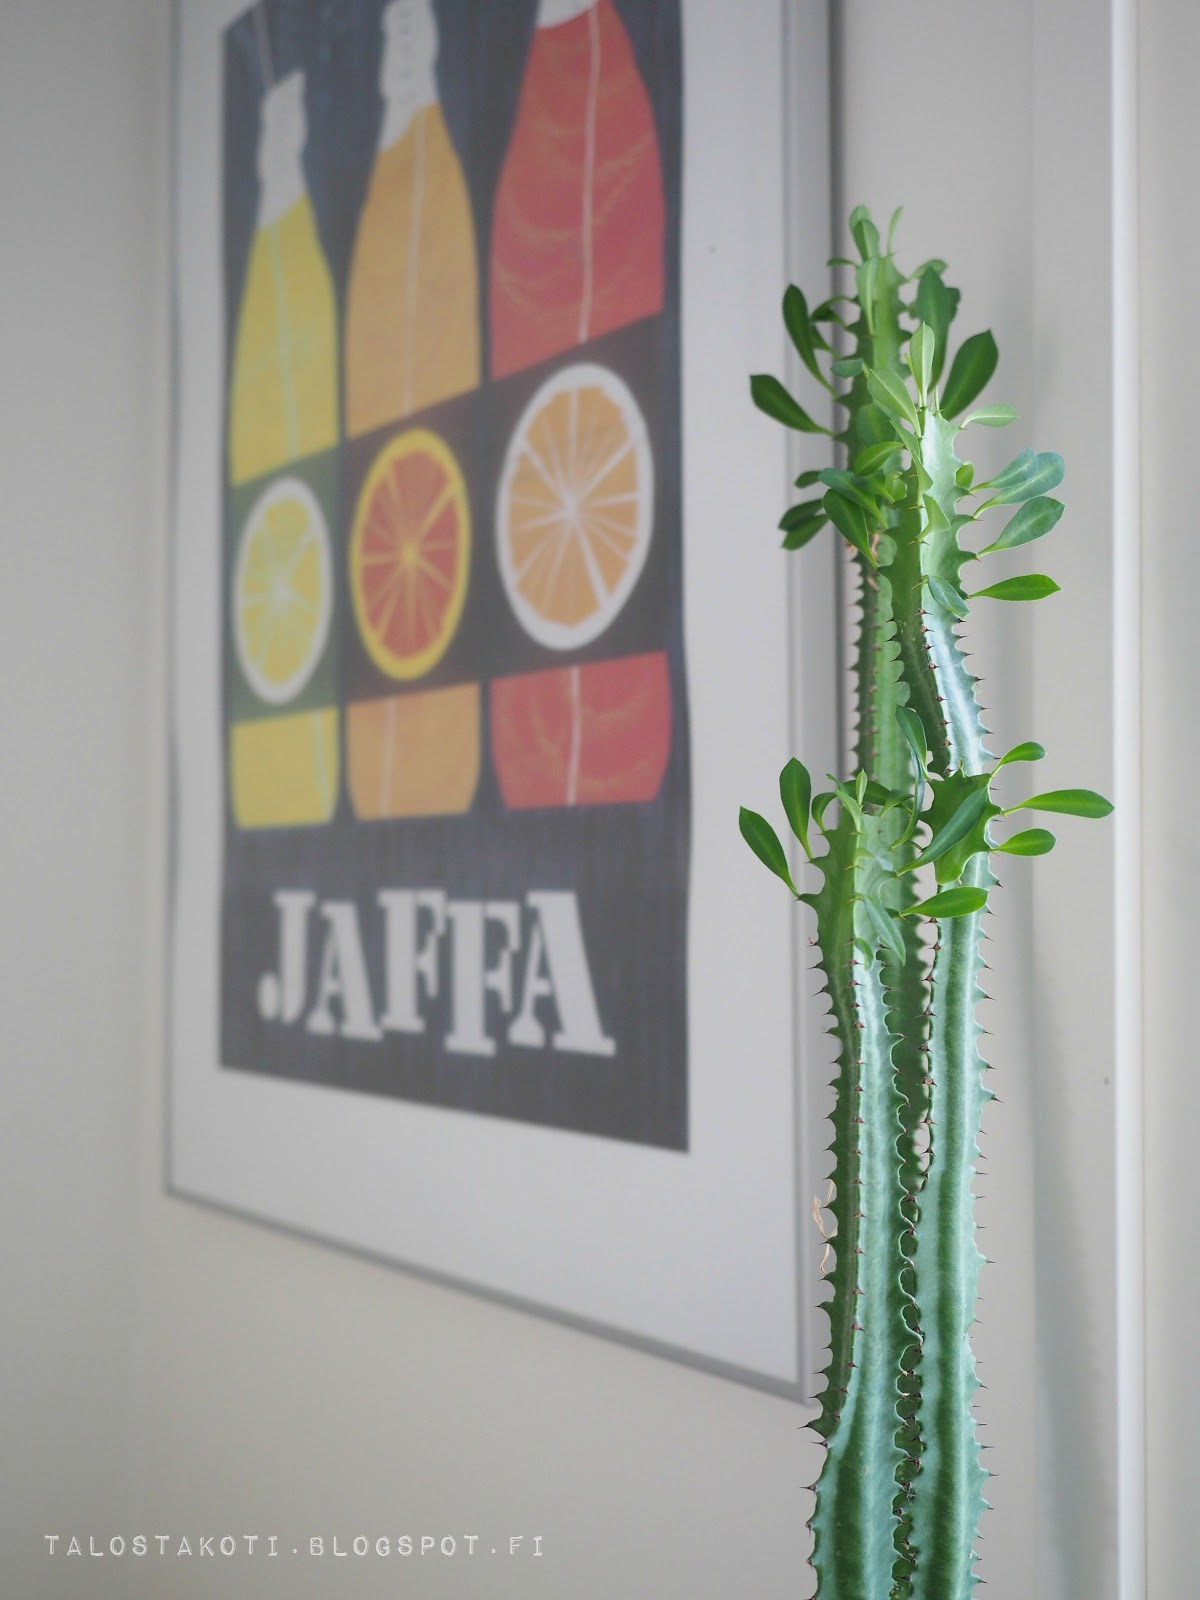 kaktus, Jaffa-juliste, Erik Bruun